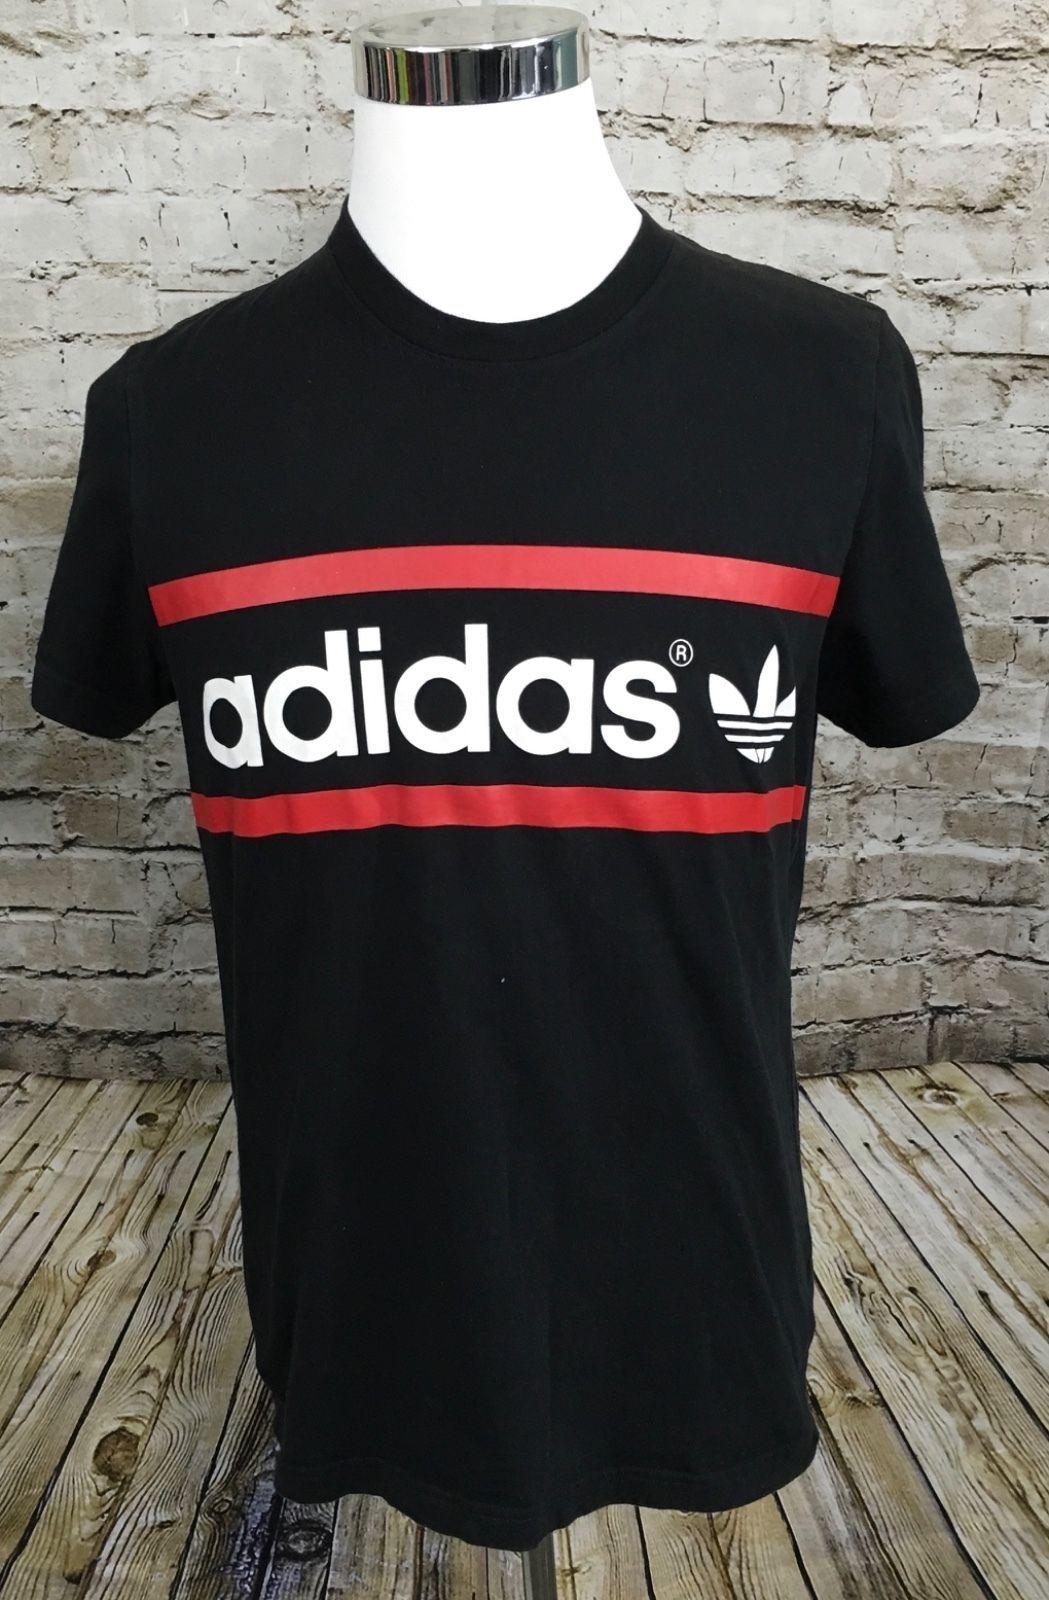 Mens ADIDAS TREFOIL Black Cotton Short Sleeve T Shirt Size L Large      G002